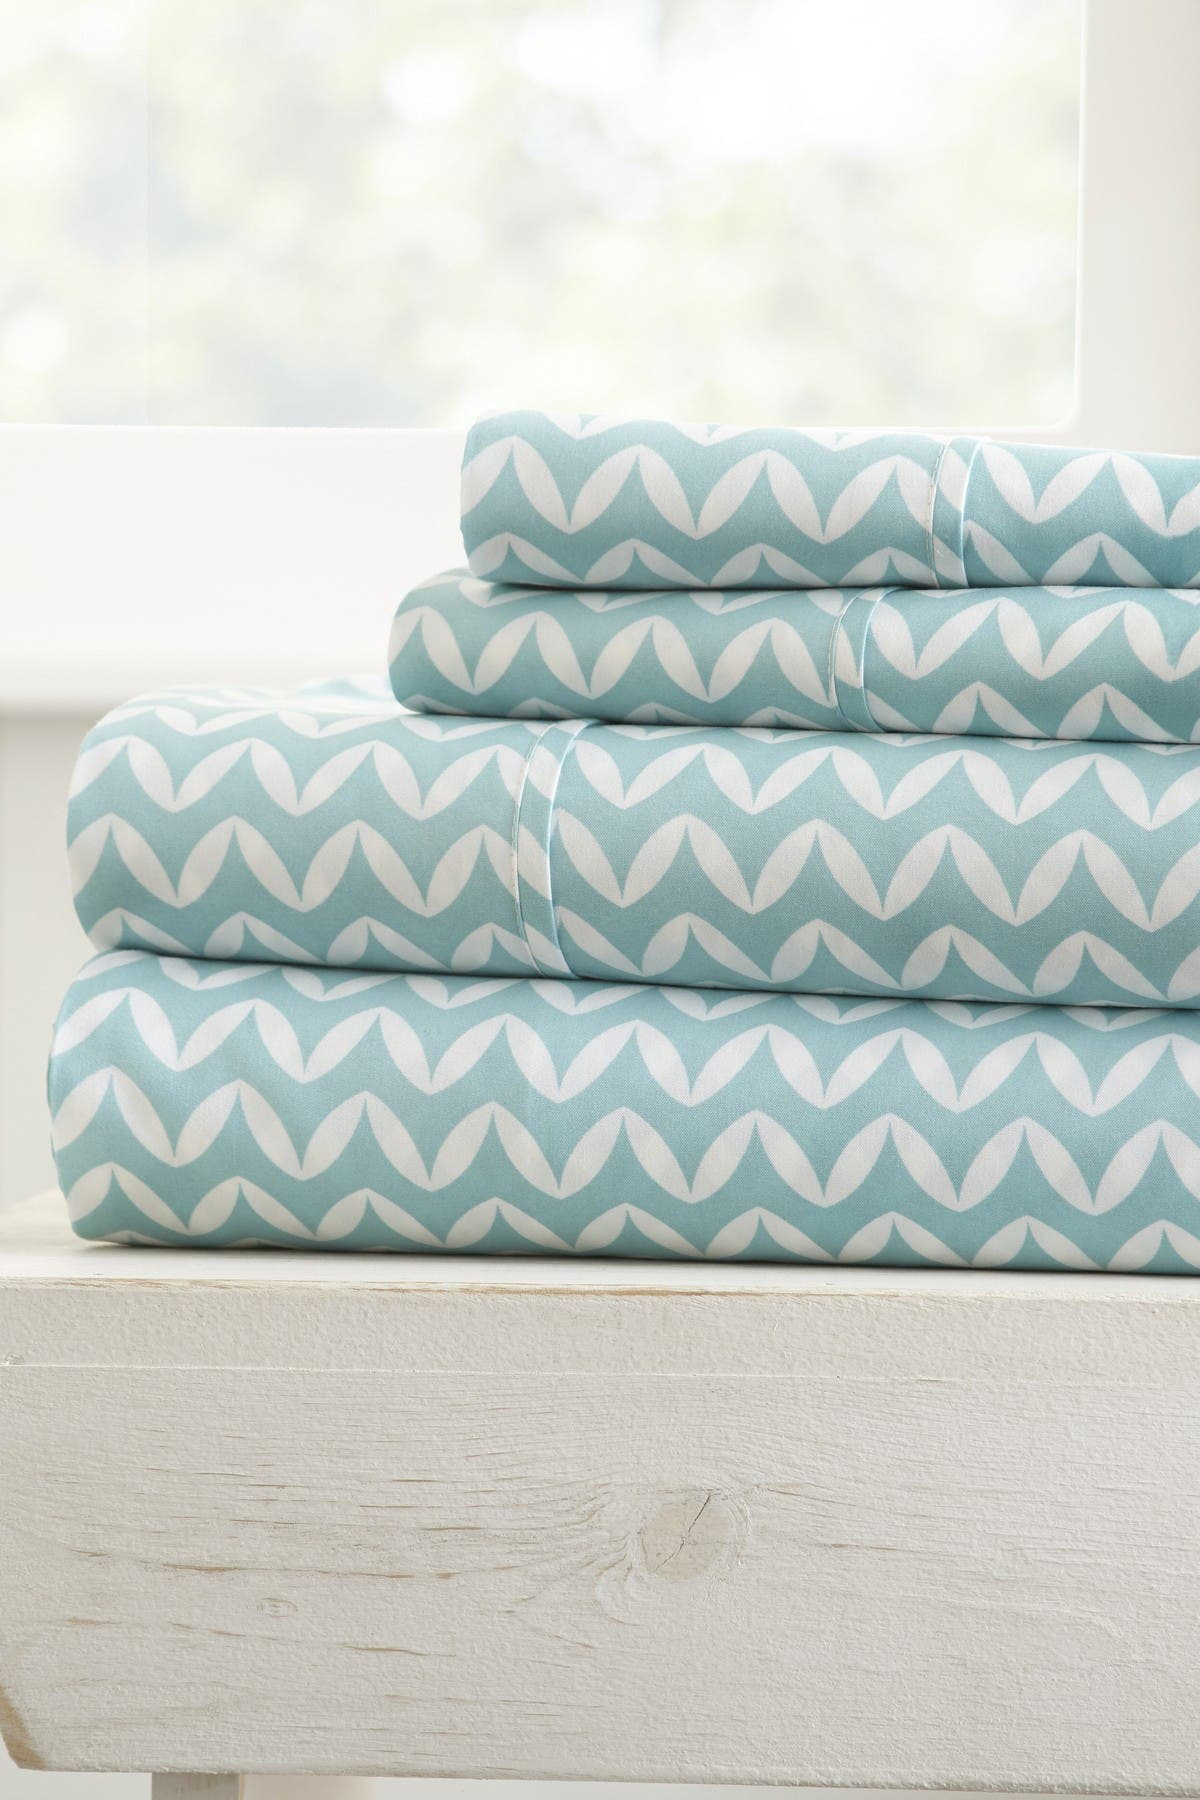 Image of IENJOY HOME The Home Spun Premium Ultra Soft Puffed Chevron Pattern 4-Piece King Bed Sheet Set - Light Blue